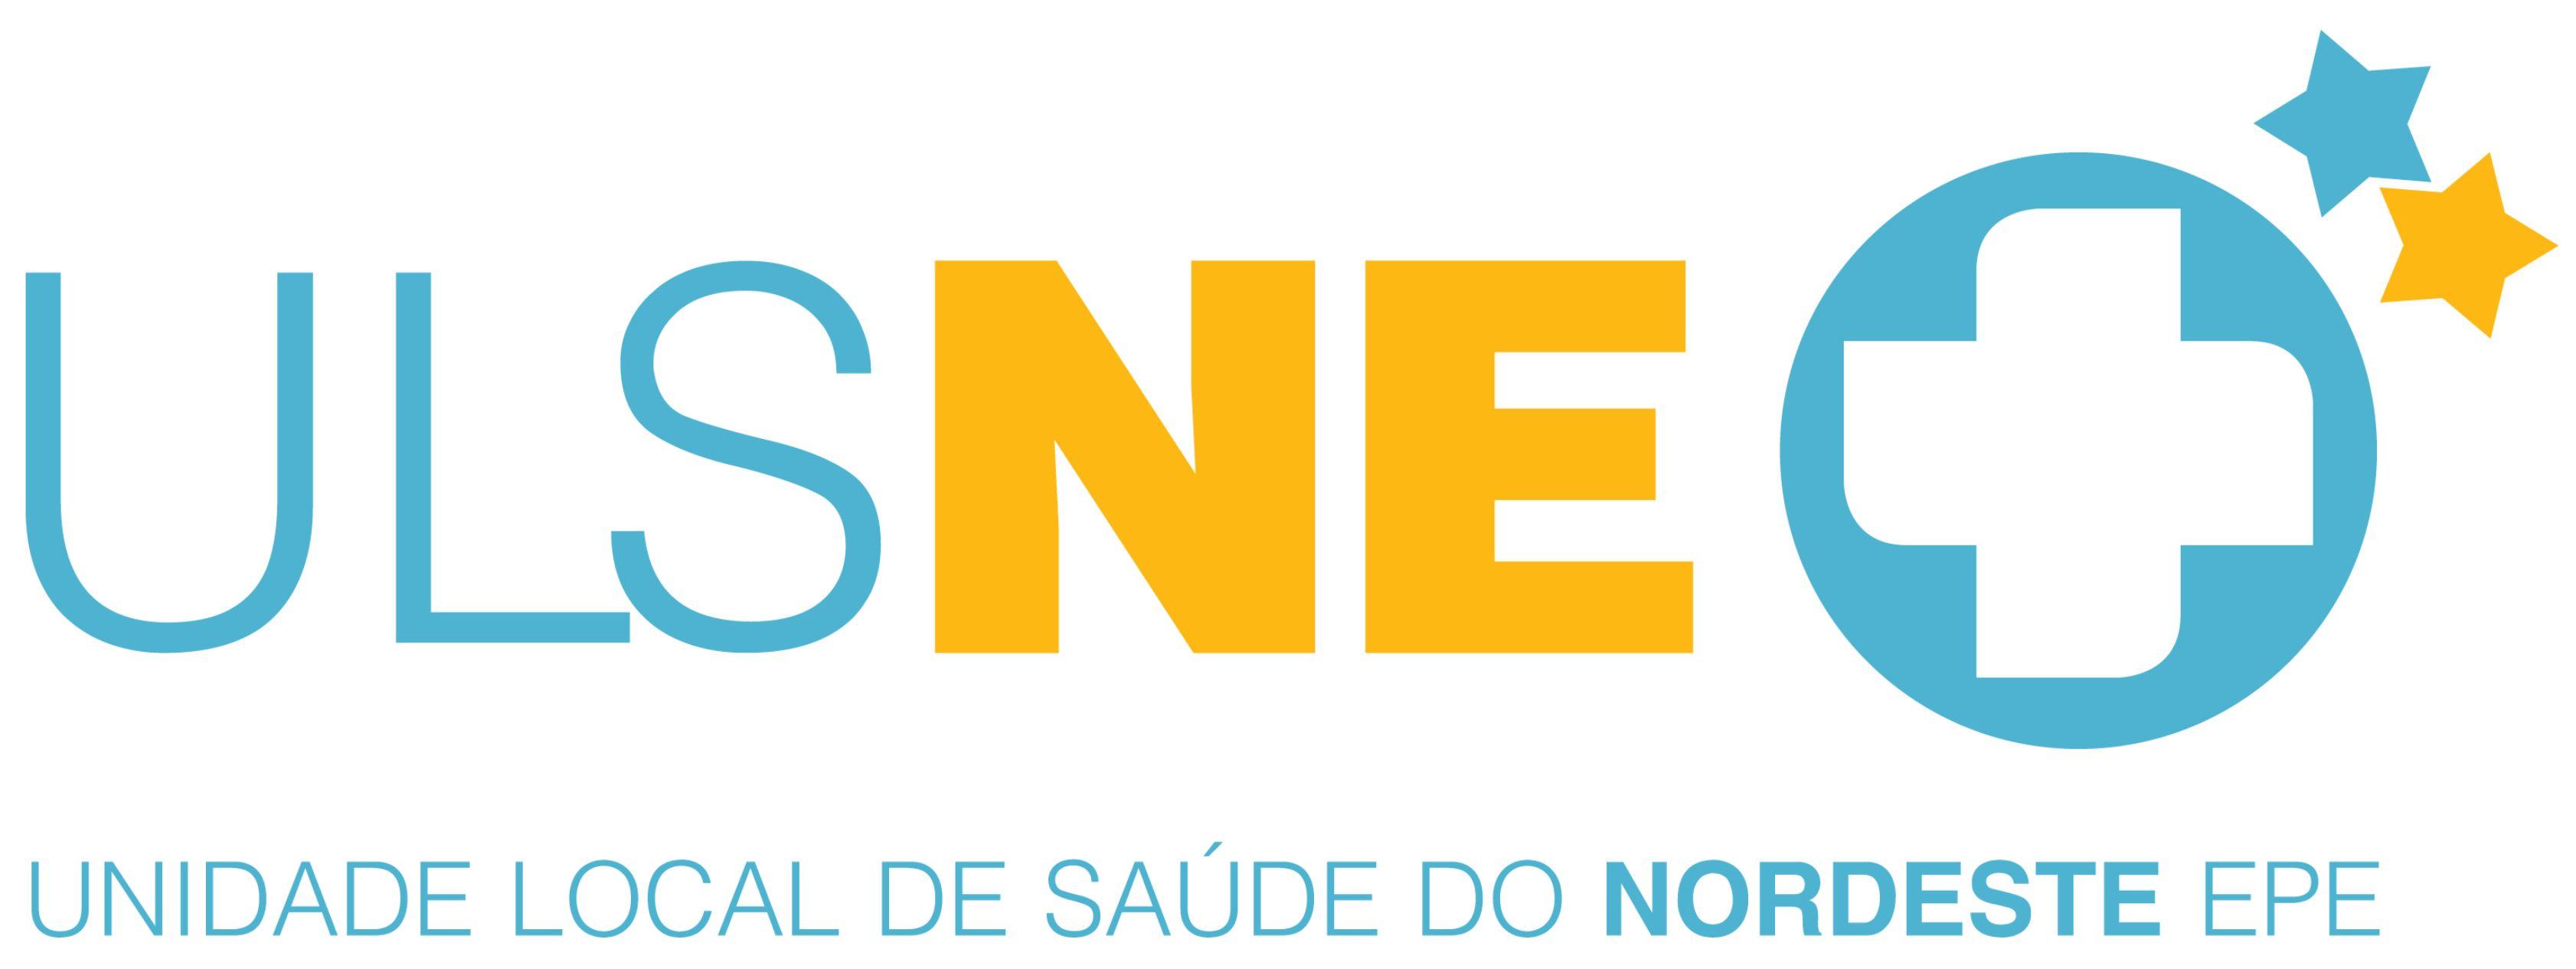 logo ulsne 2017 pagina entidade